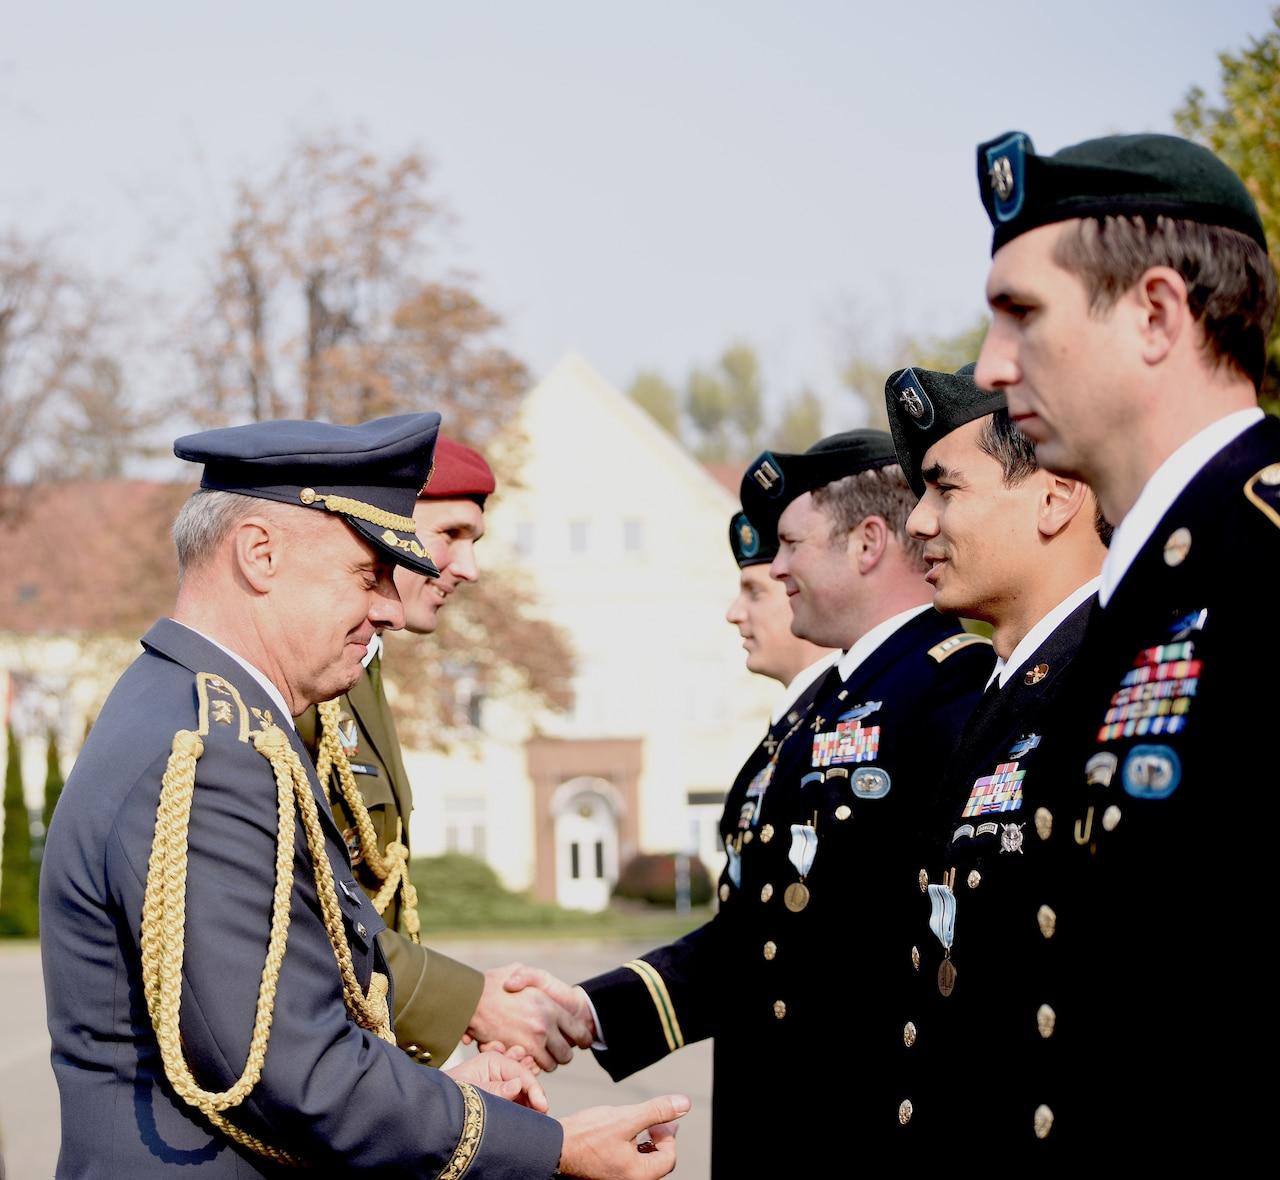 Men in military dress uniforms shake hands.